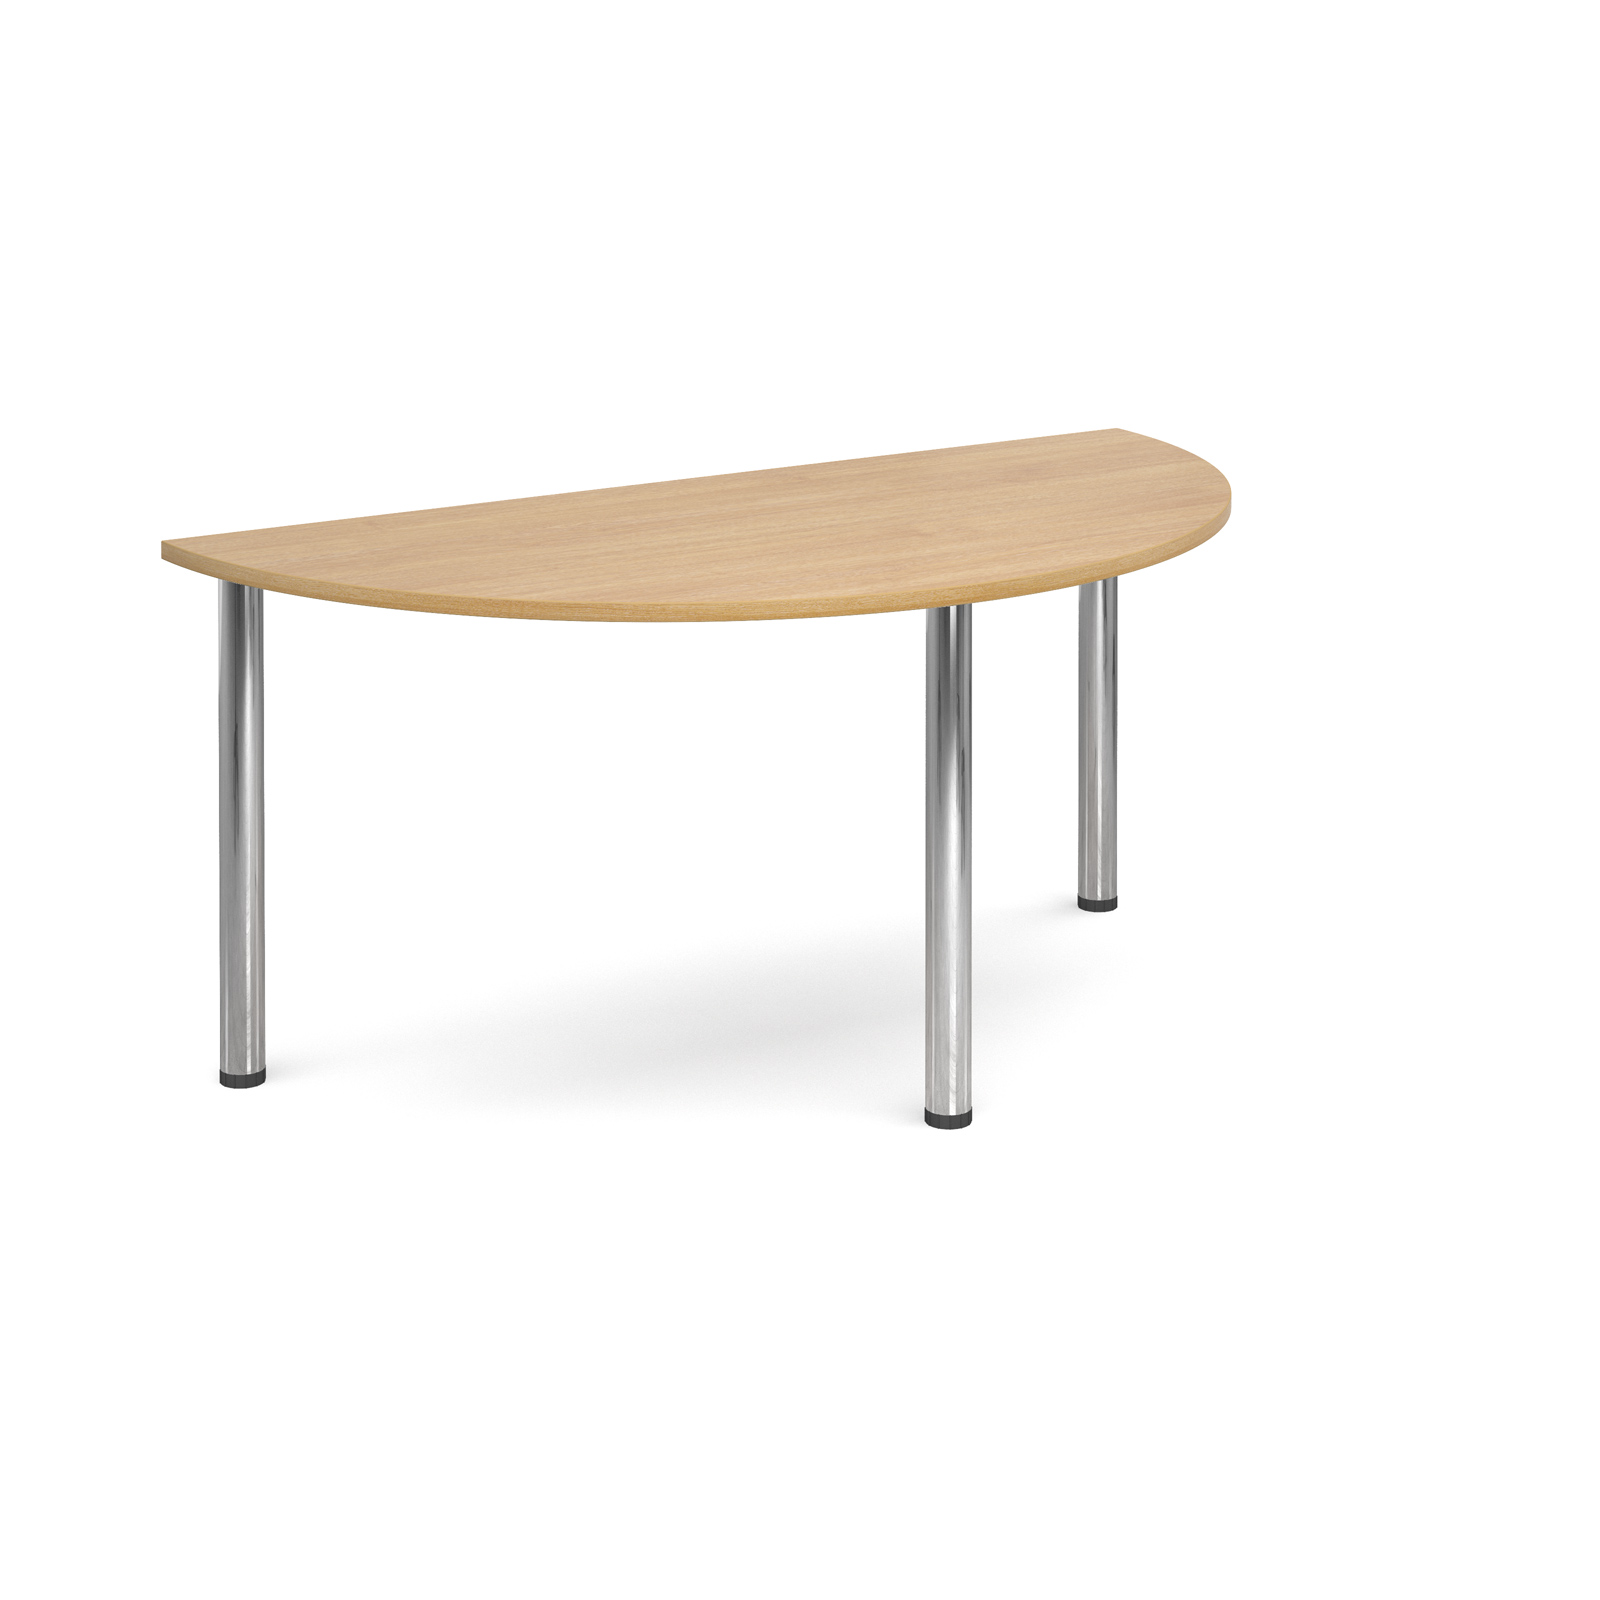 Semi circular deluxe chrome radial leg table 1600mm x 800mm - oak